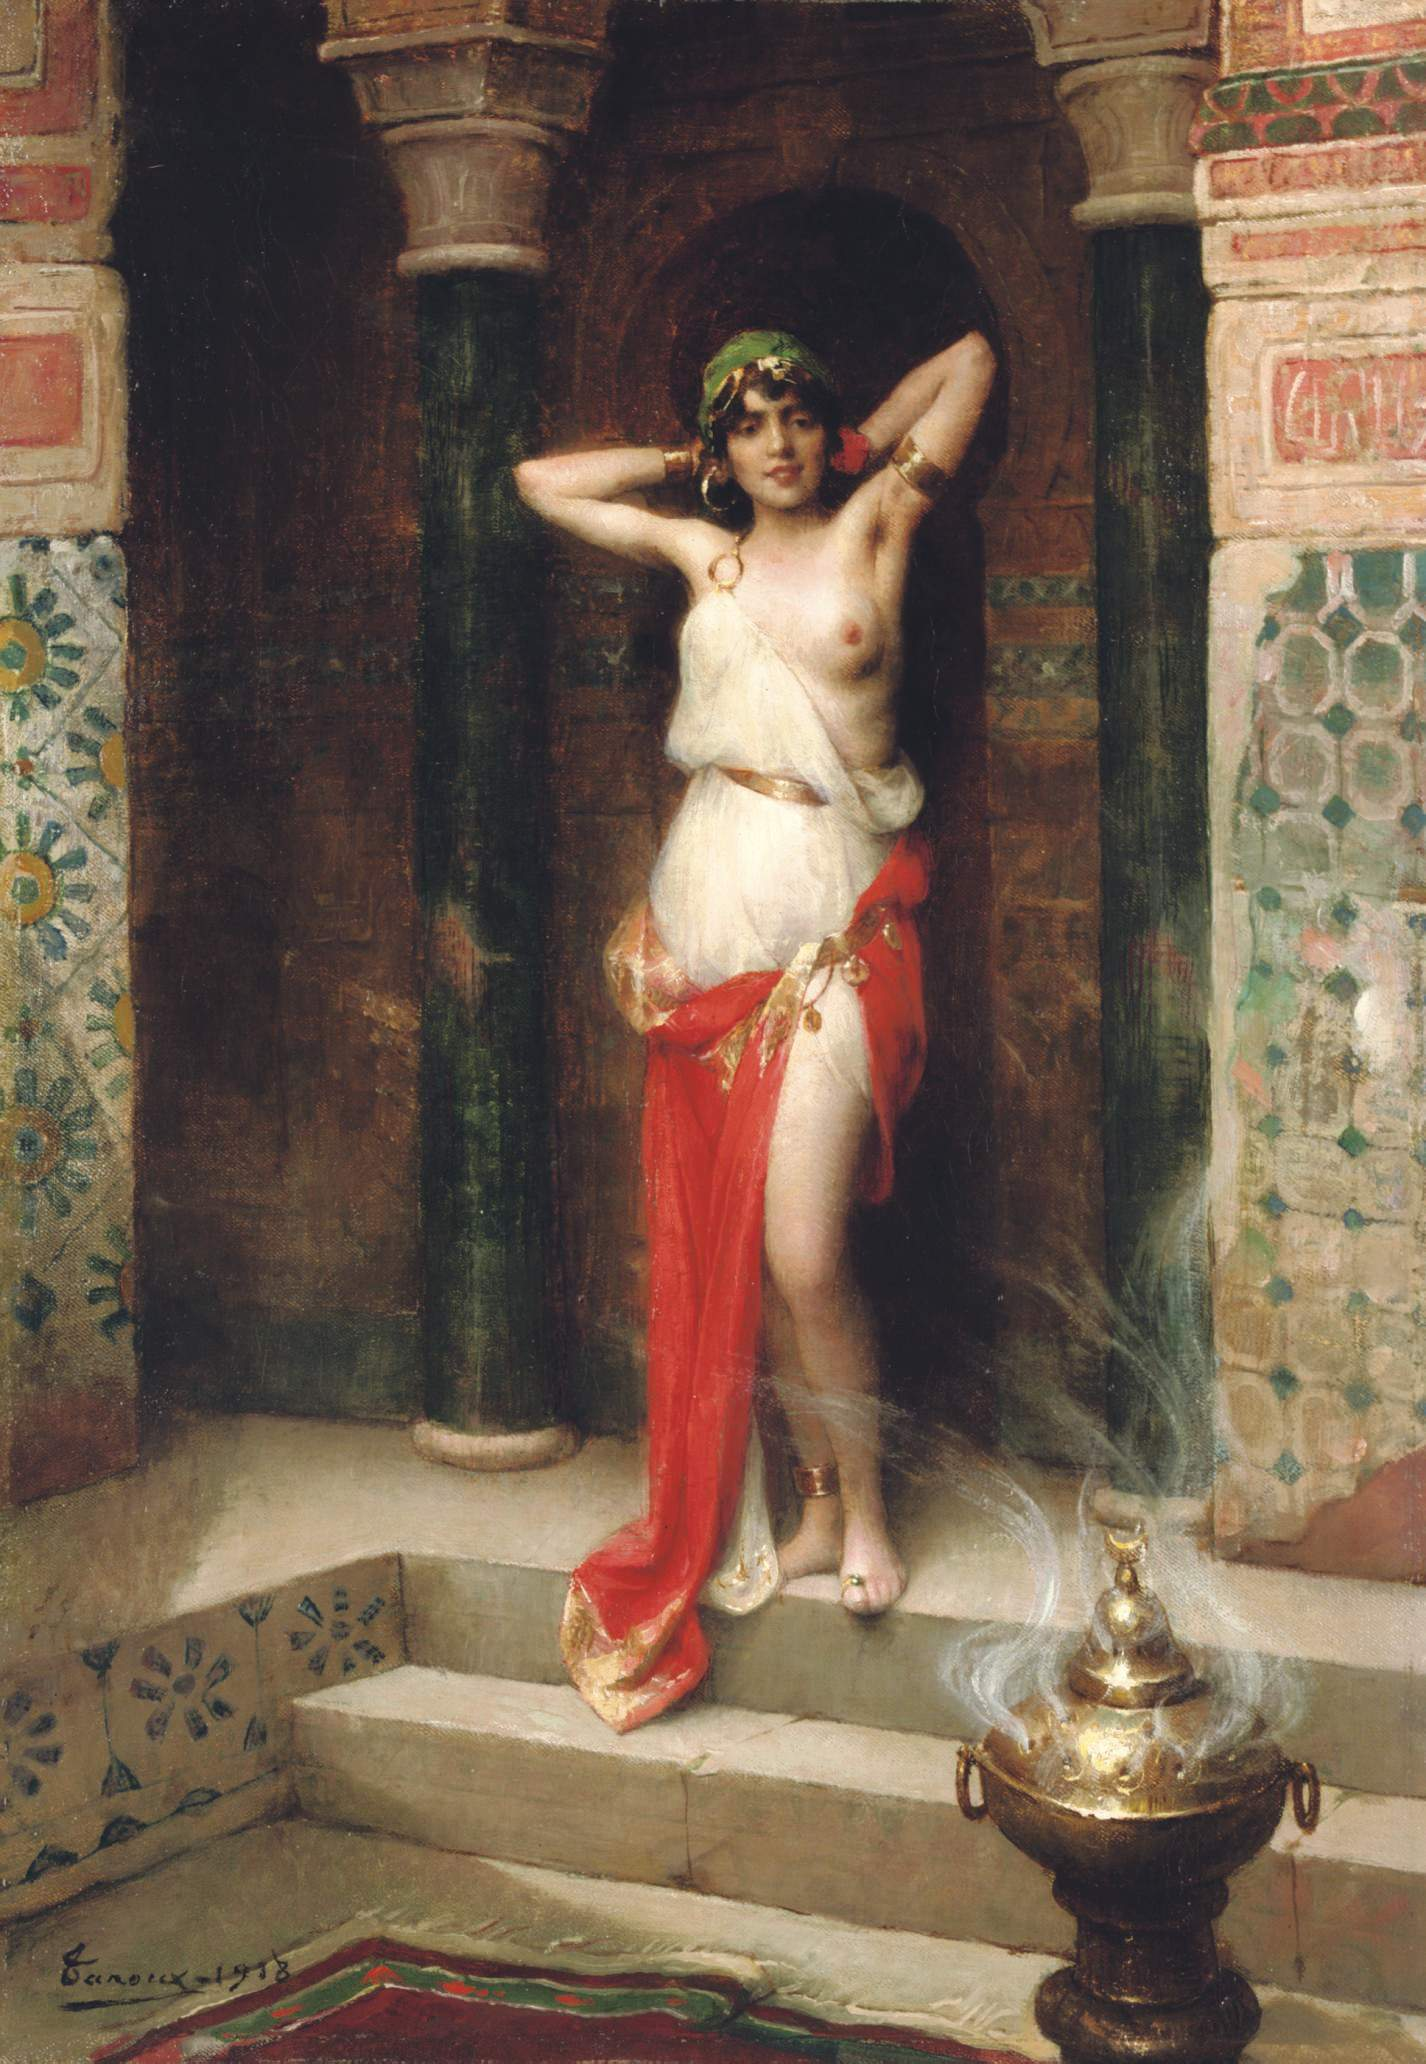 Adrien Henri Tanoux, 1865-1923. Красавица гарема. 1918. 55 х 38.4 см. Частная коллекция